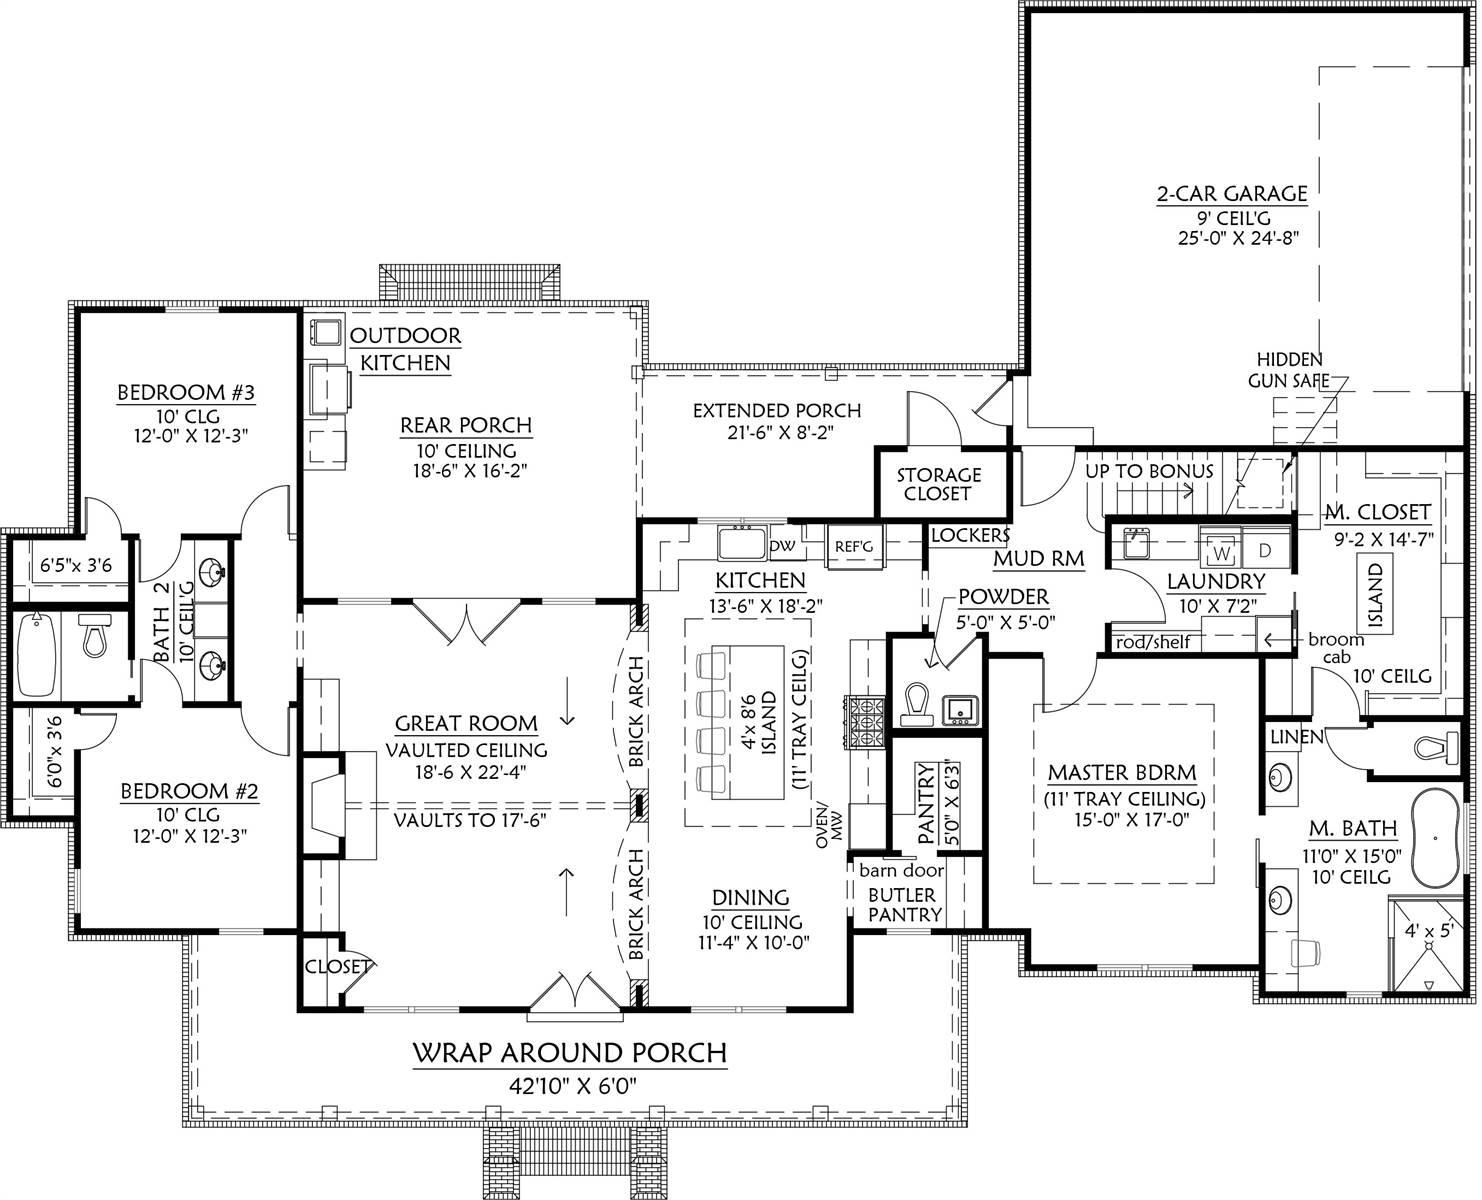 2-Car Garage Plan by DFD House Plans